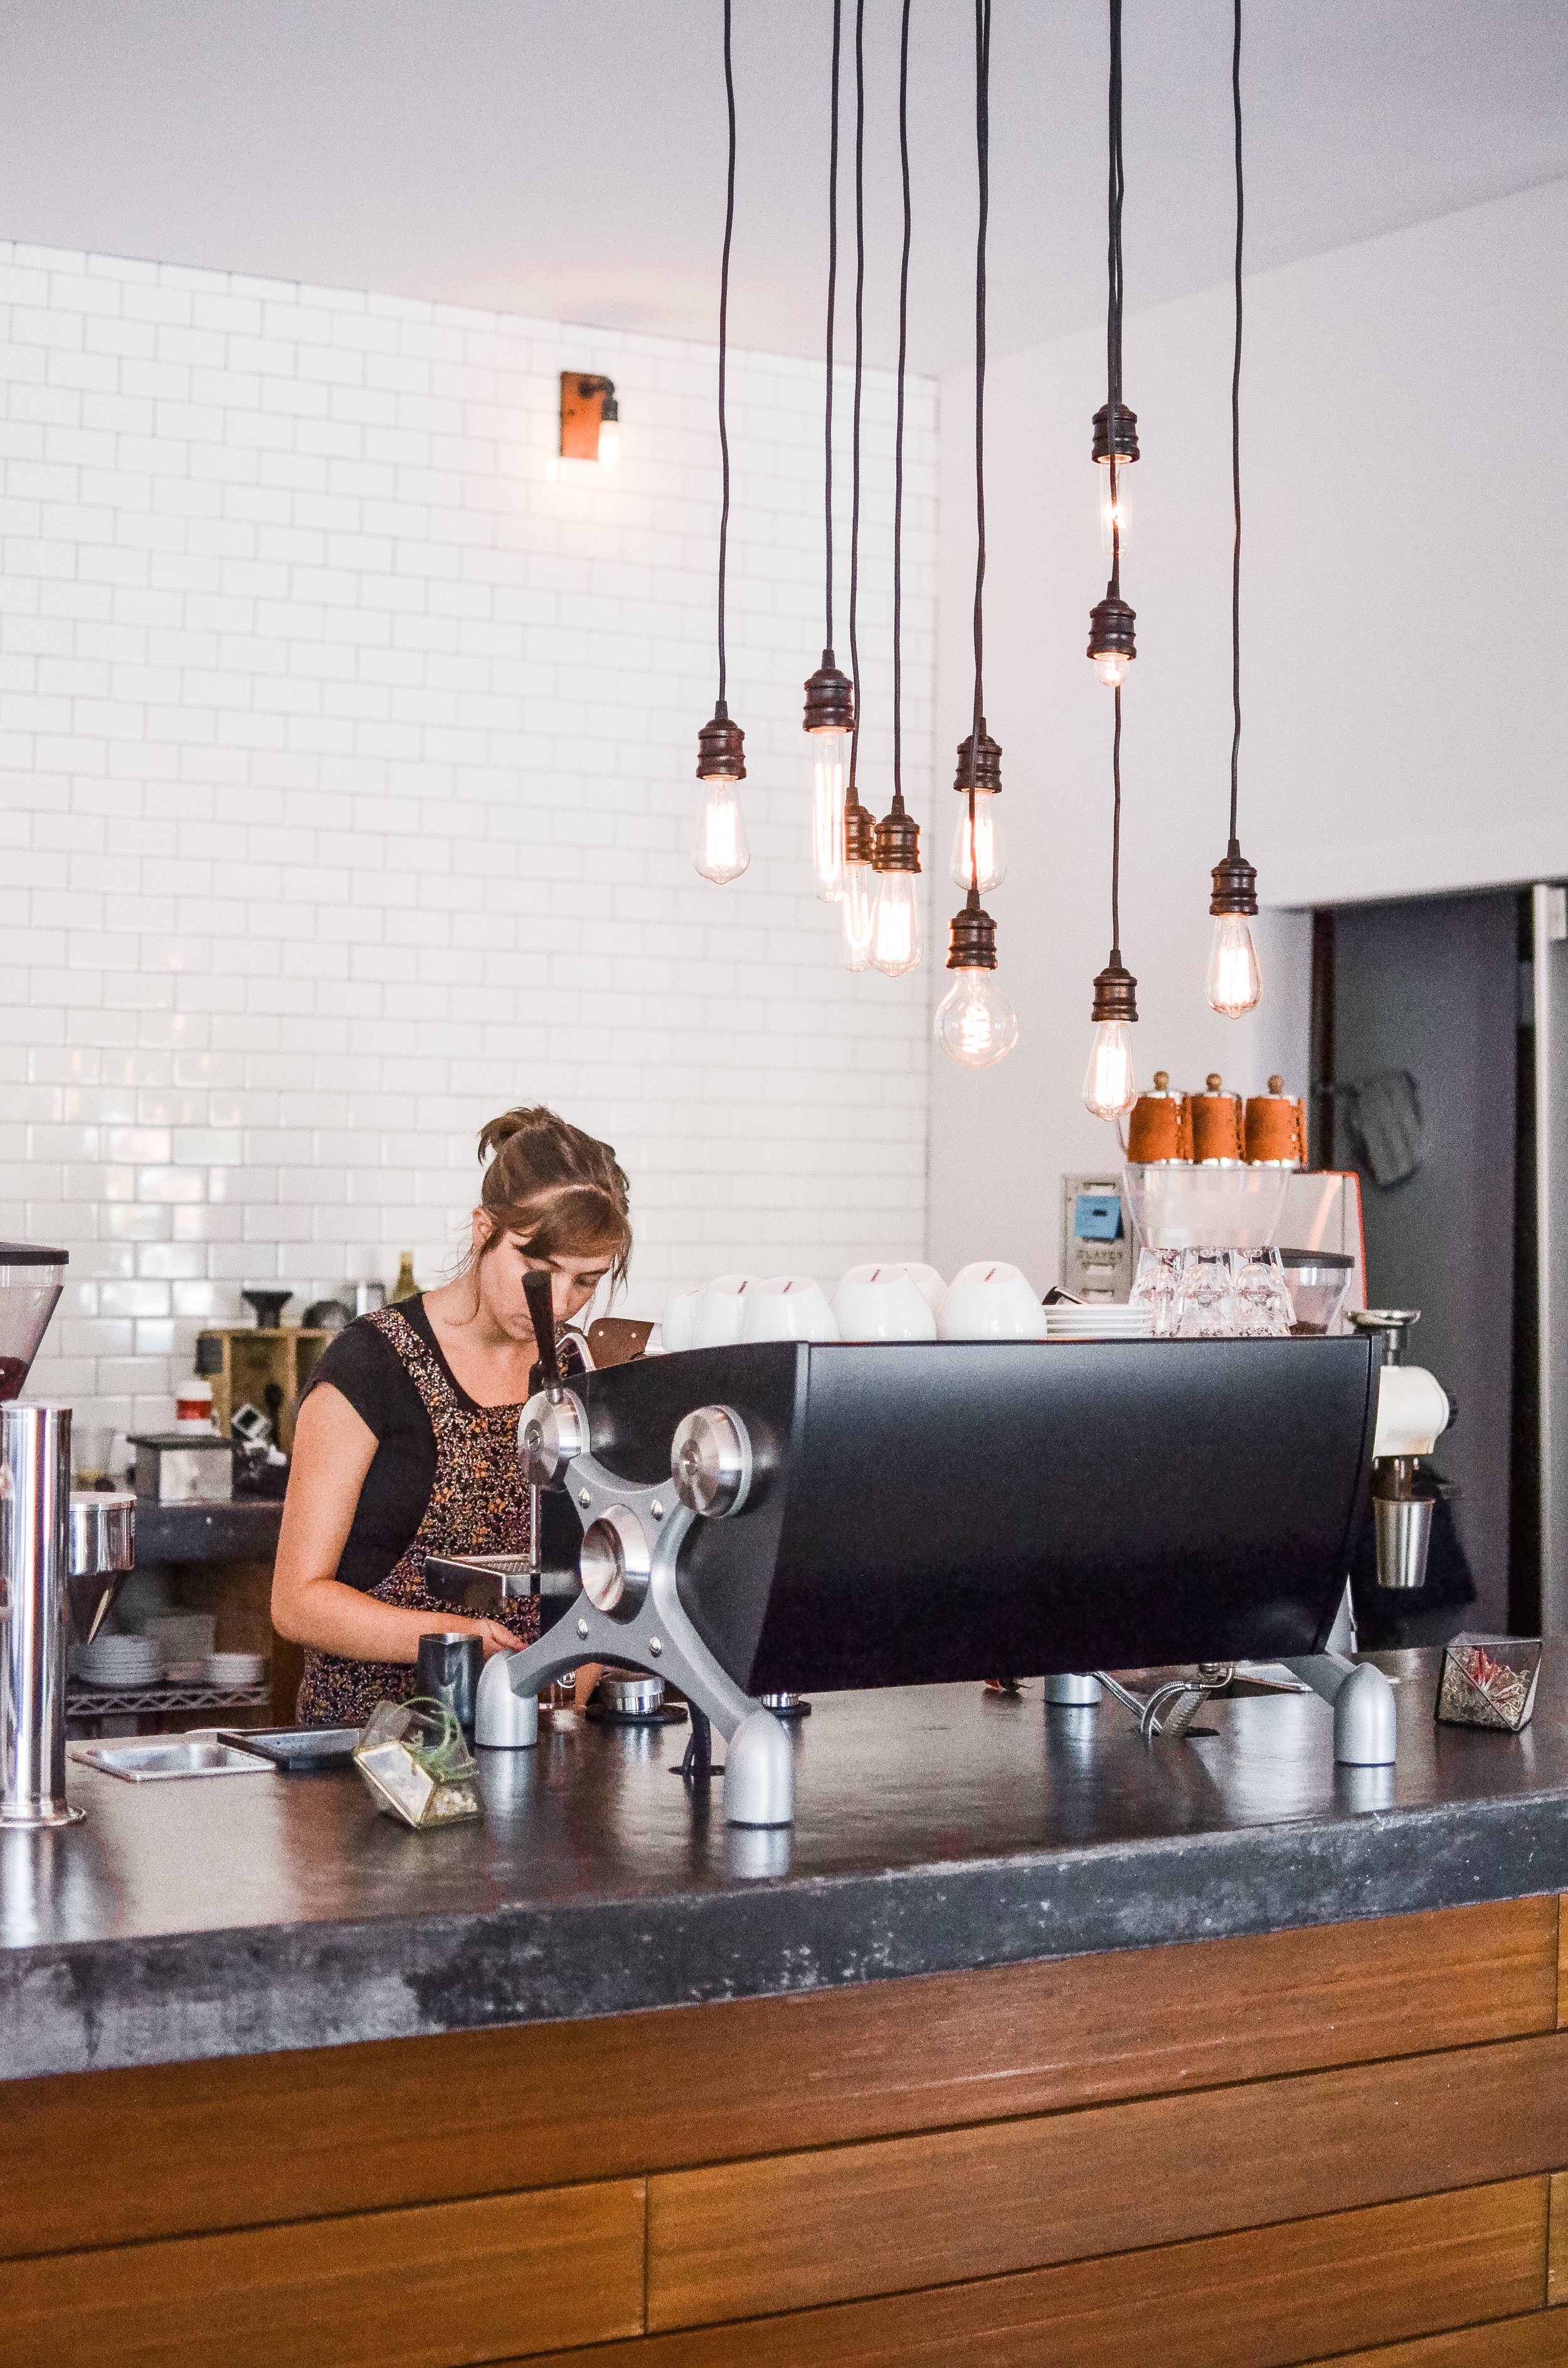 Wendling_Boyd_Mundos_Coffee_Roasters_Traverse_City-10.jpg